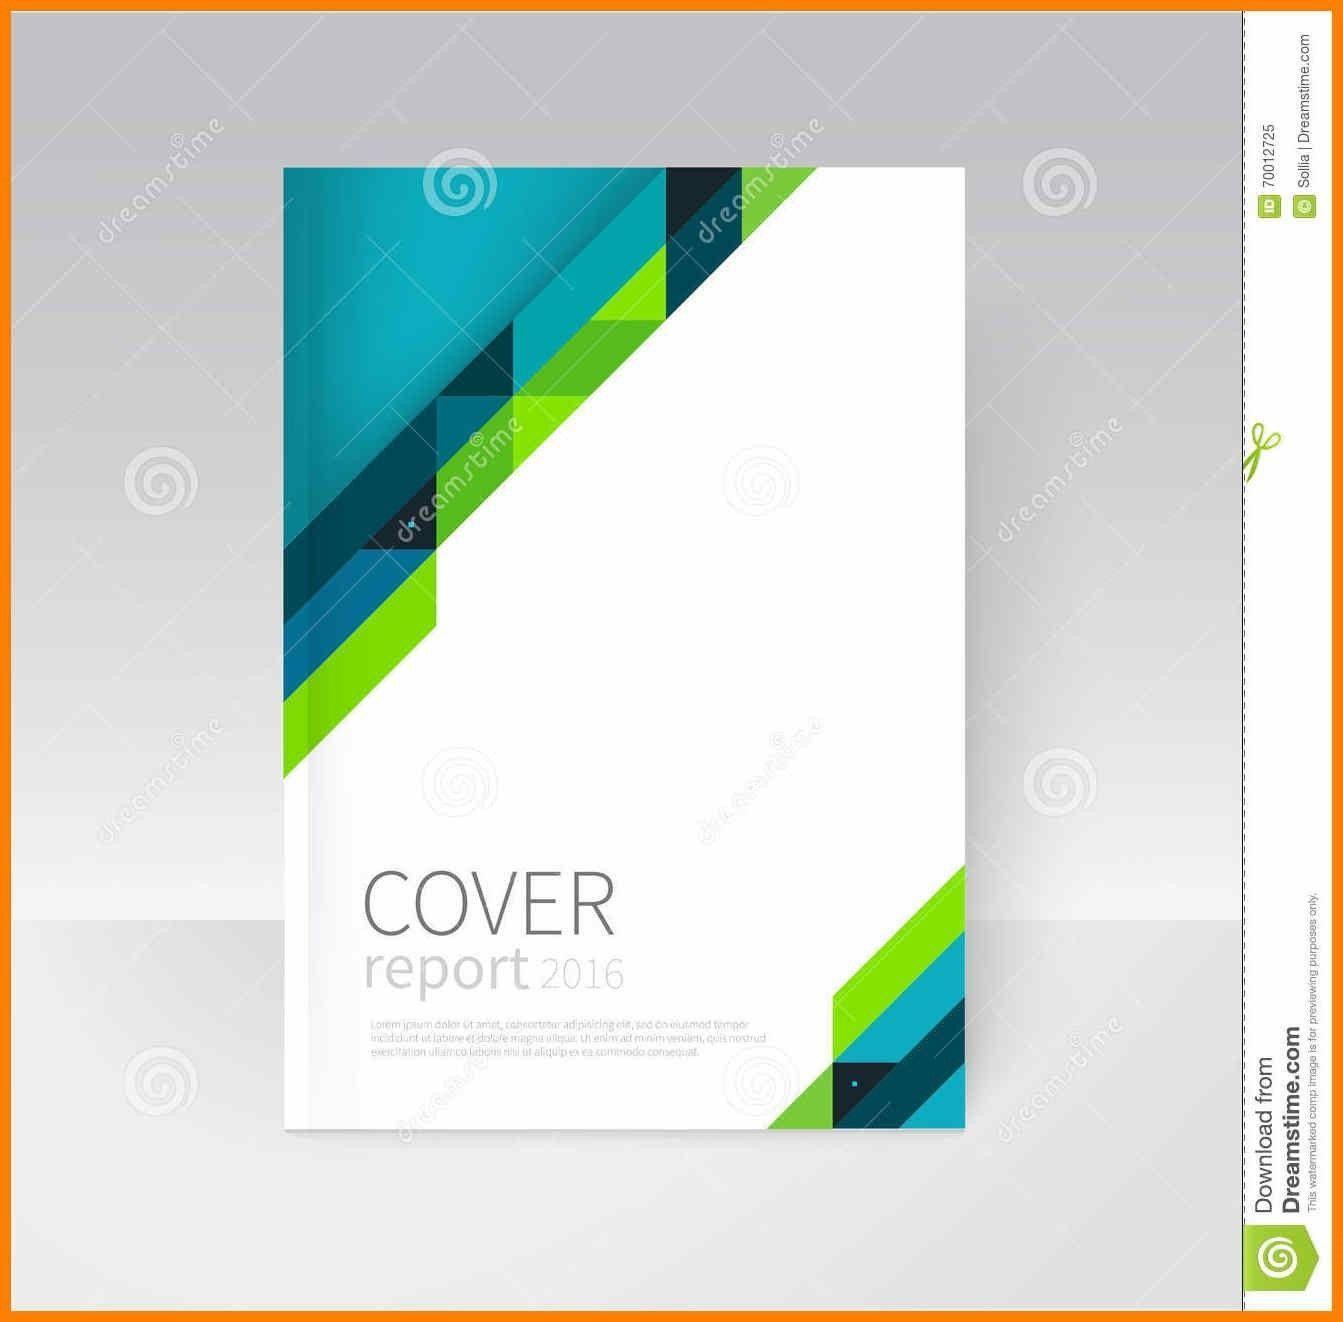 000 Fascinating Microsoft Word Template Download High Resolution  M Cv Free HeaderFull